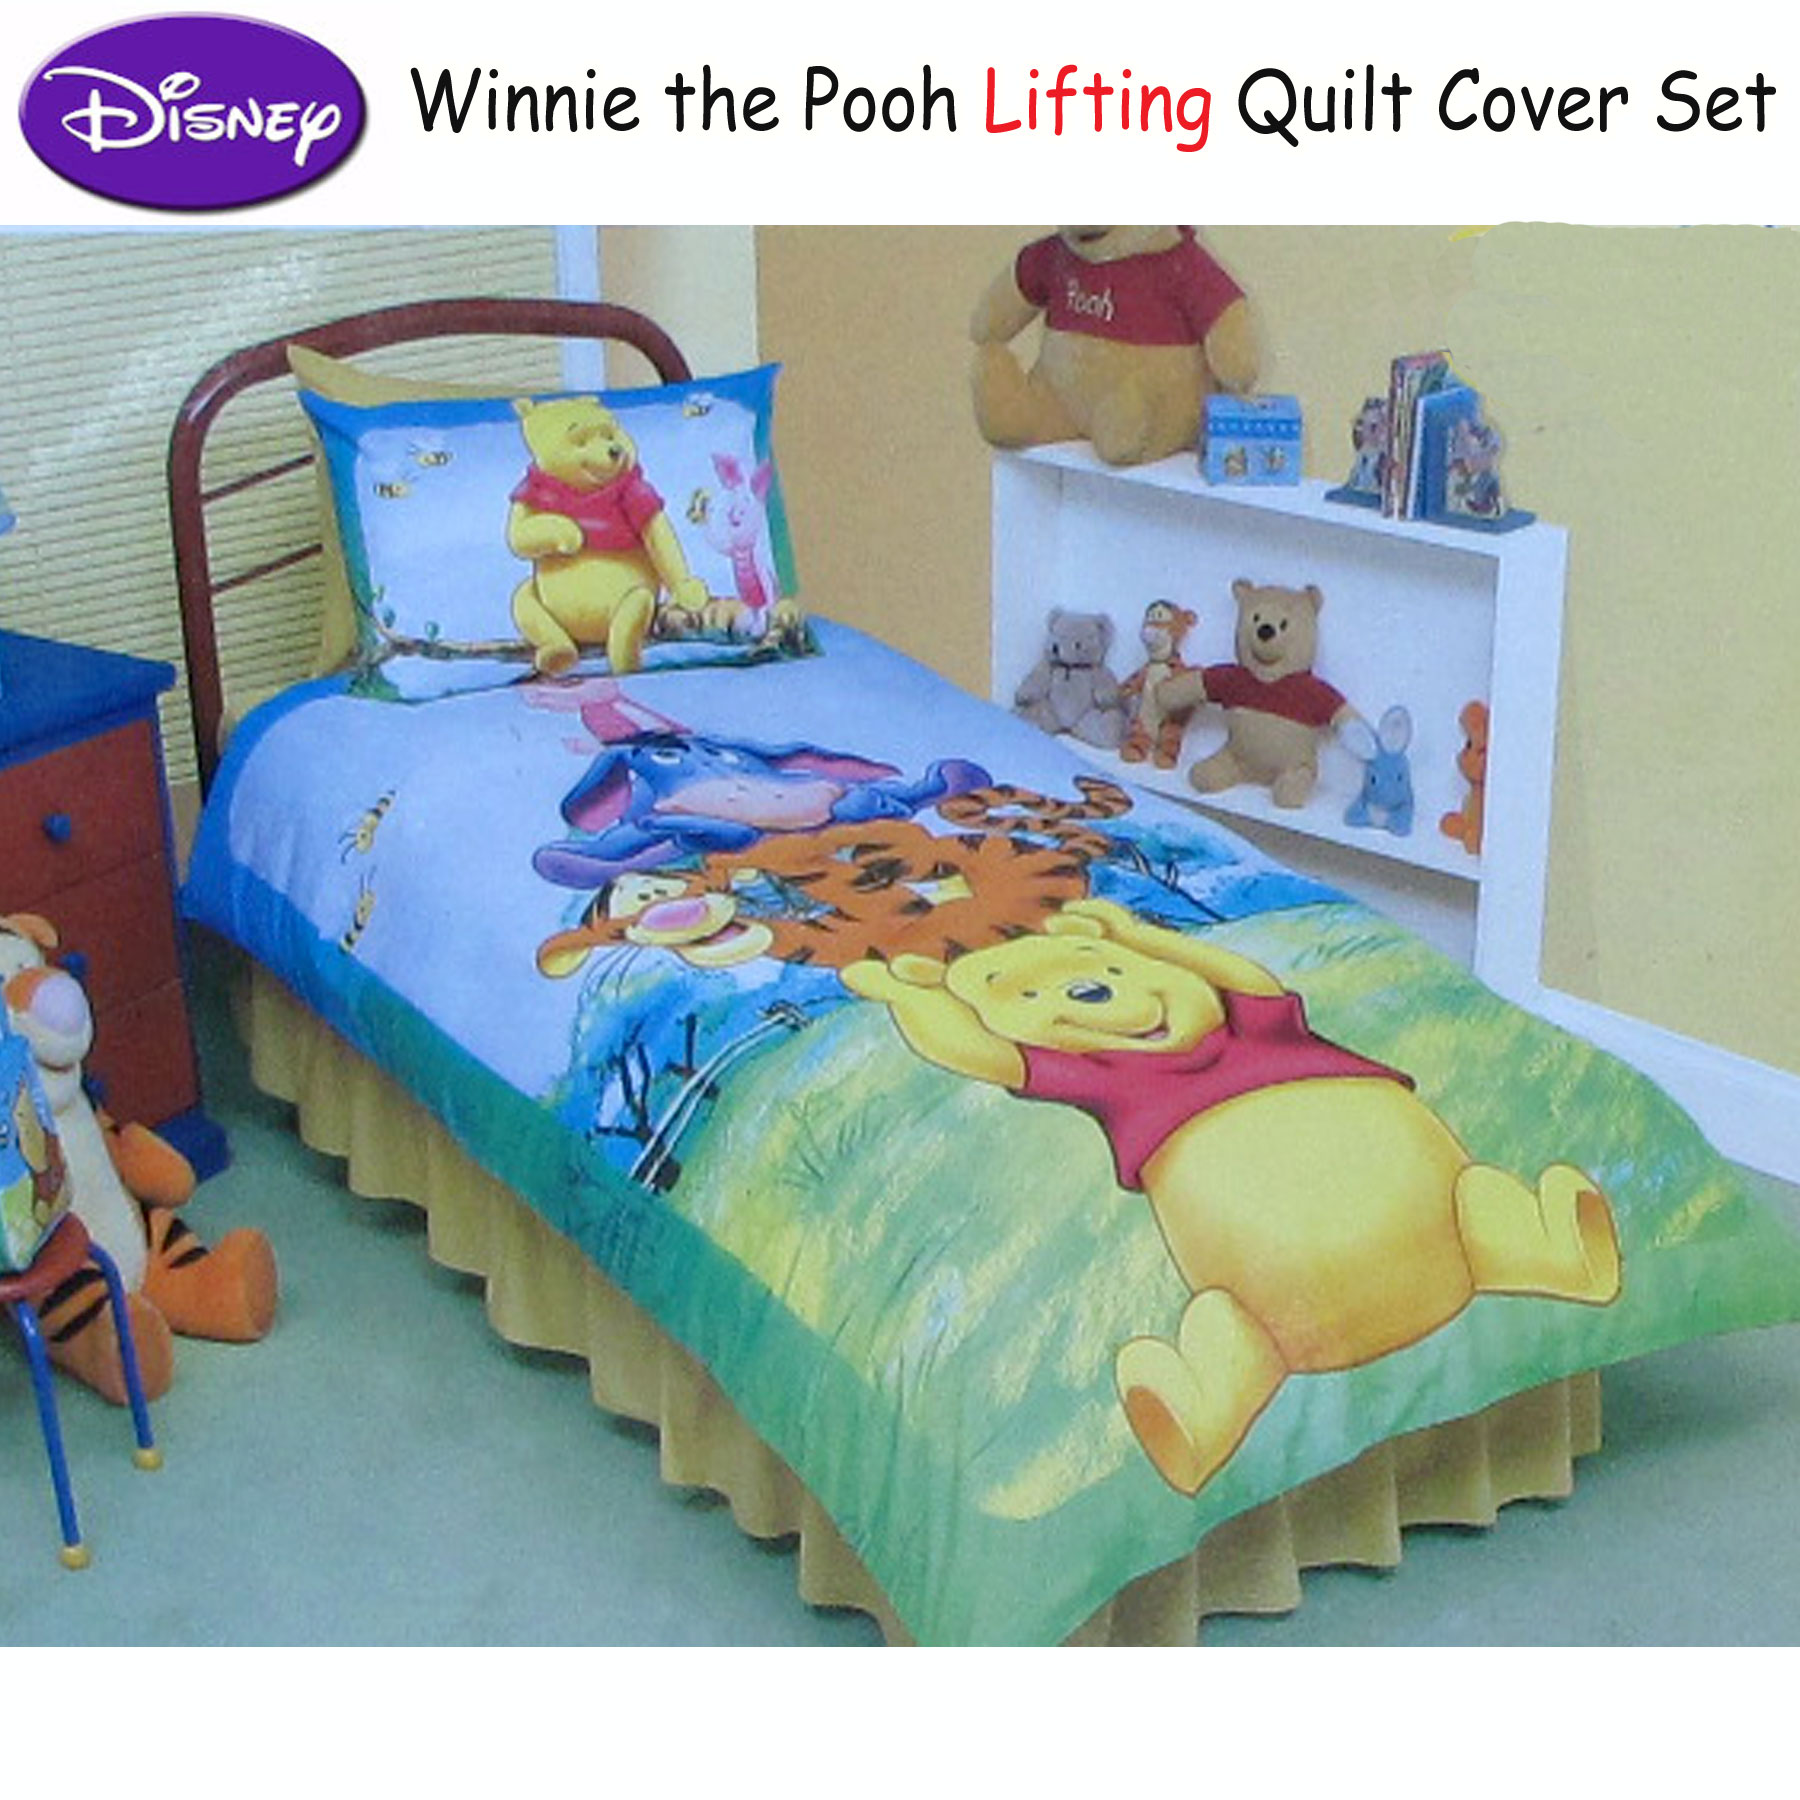 GENUINE DISNEY WINNIE THE POOH SINGLE BED DUVET COVER PILLOWCASE SET 100/% COTTON